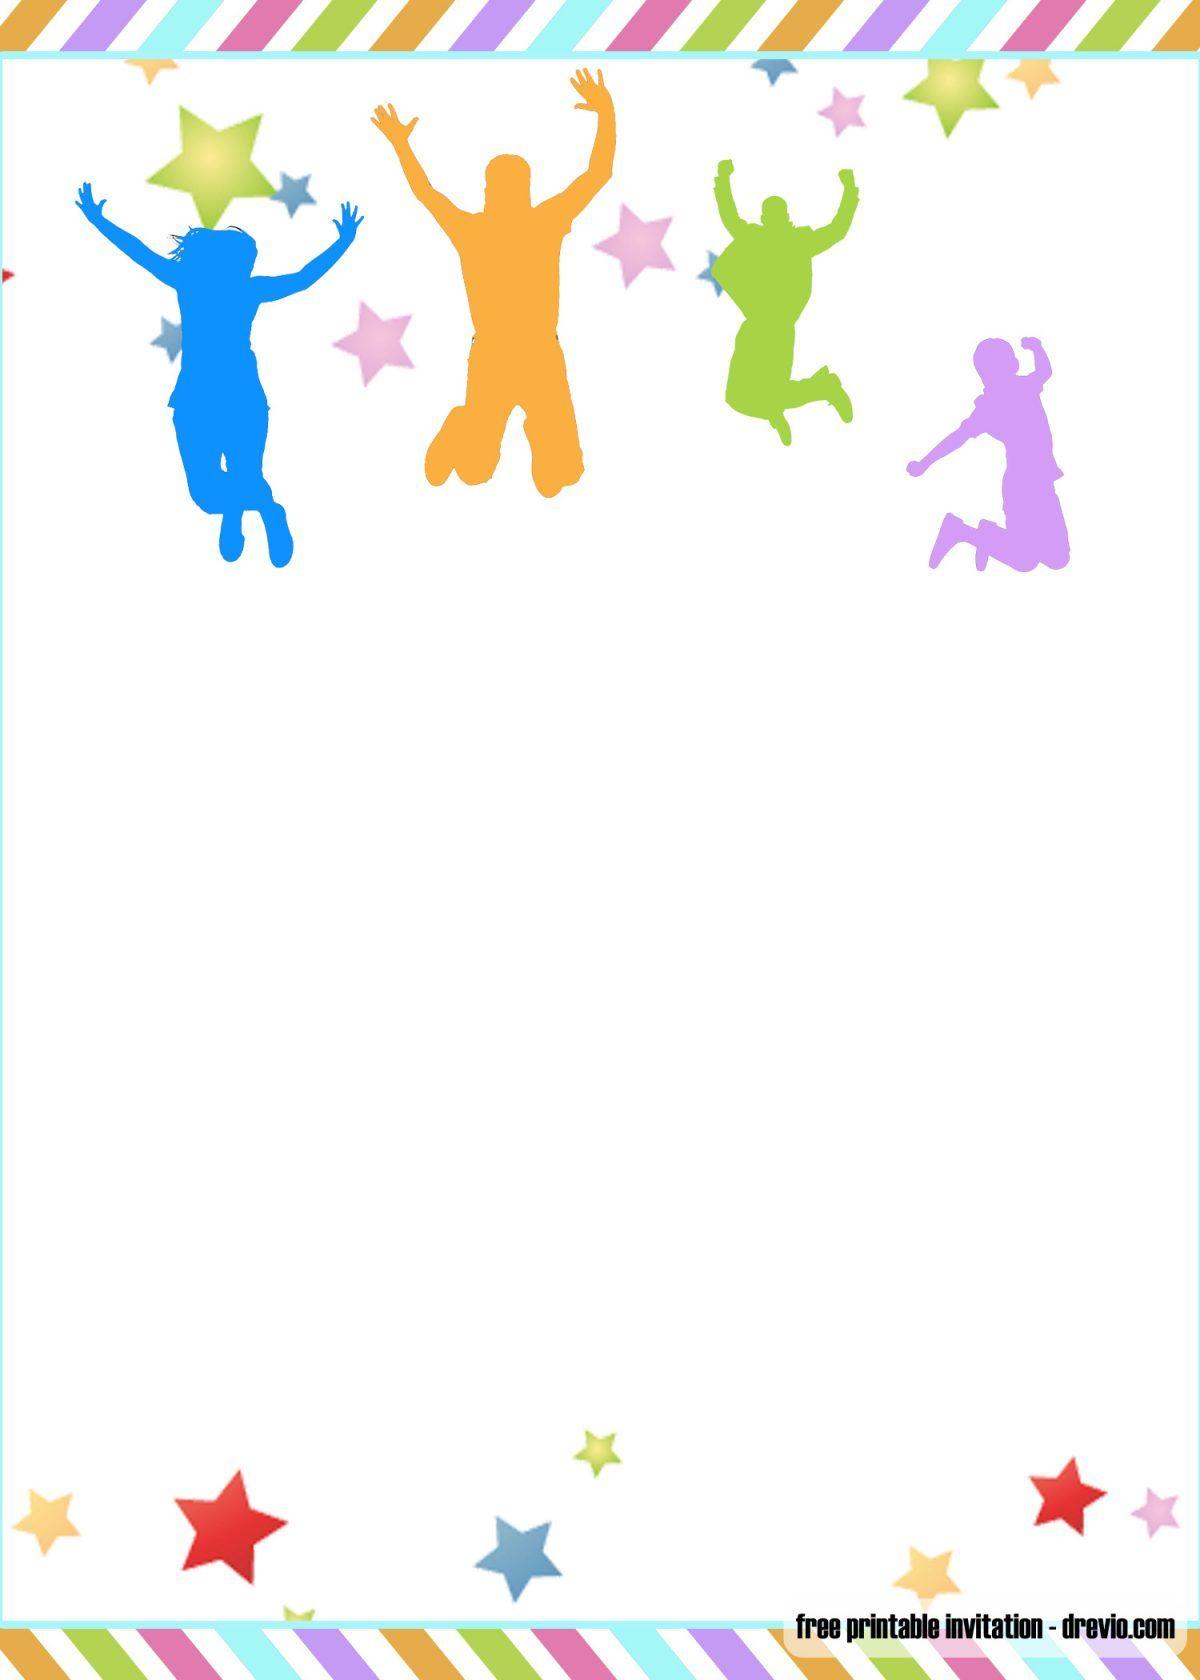 Free Printable Trampoline Jump Birthday Invitation Templates Free Printable Birthday Invitations Trampoline Birthday Invitations Minion Birthday Invitations